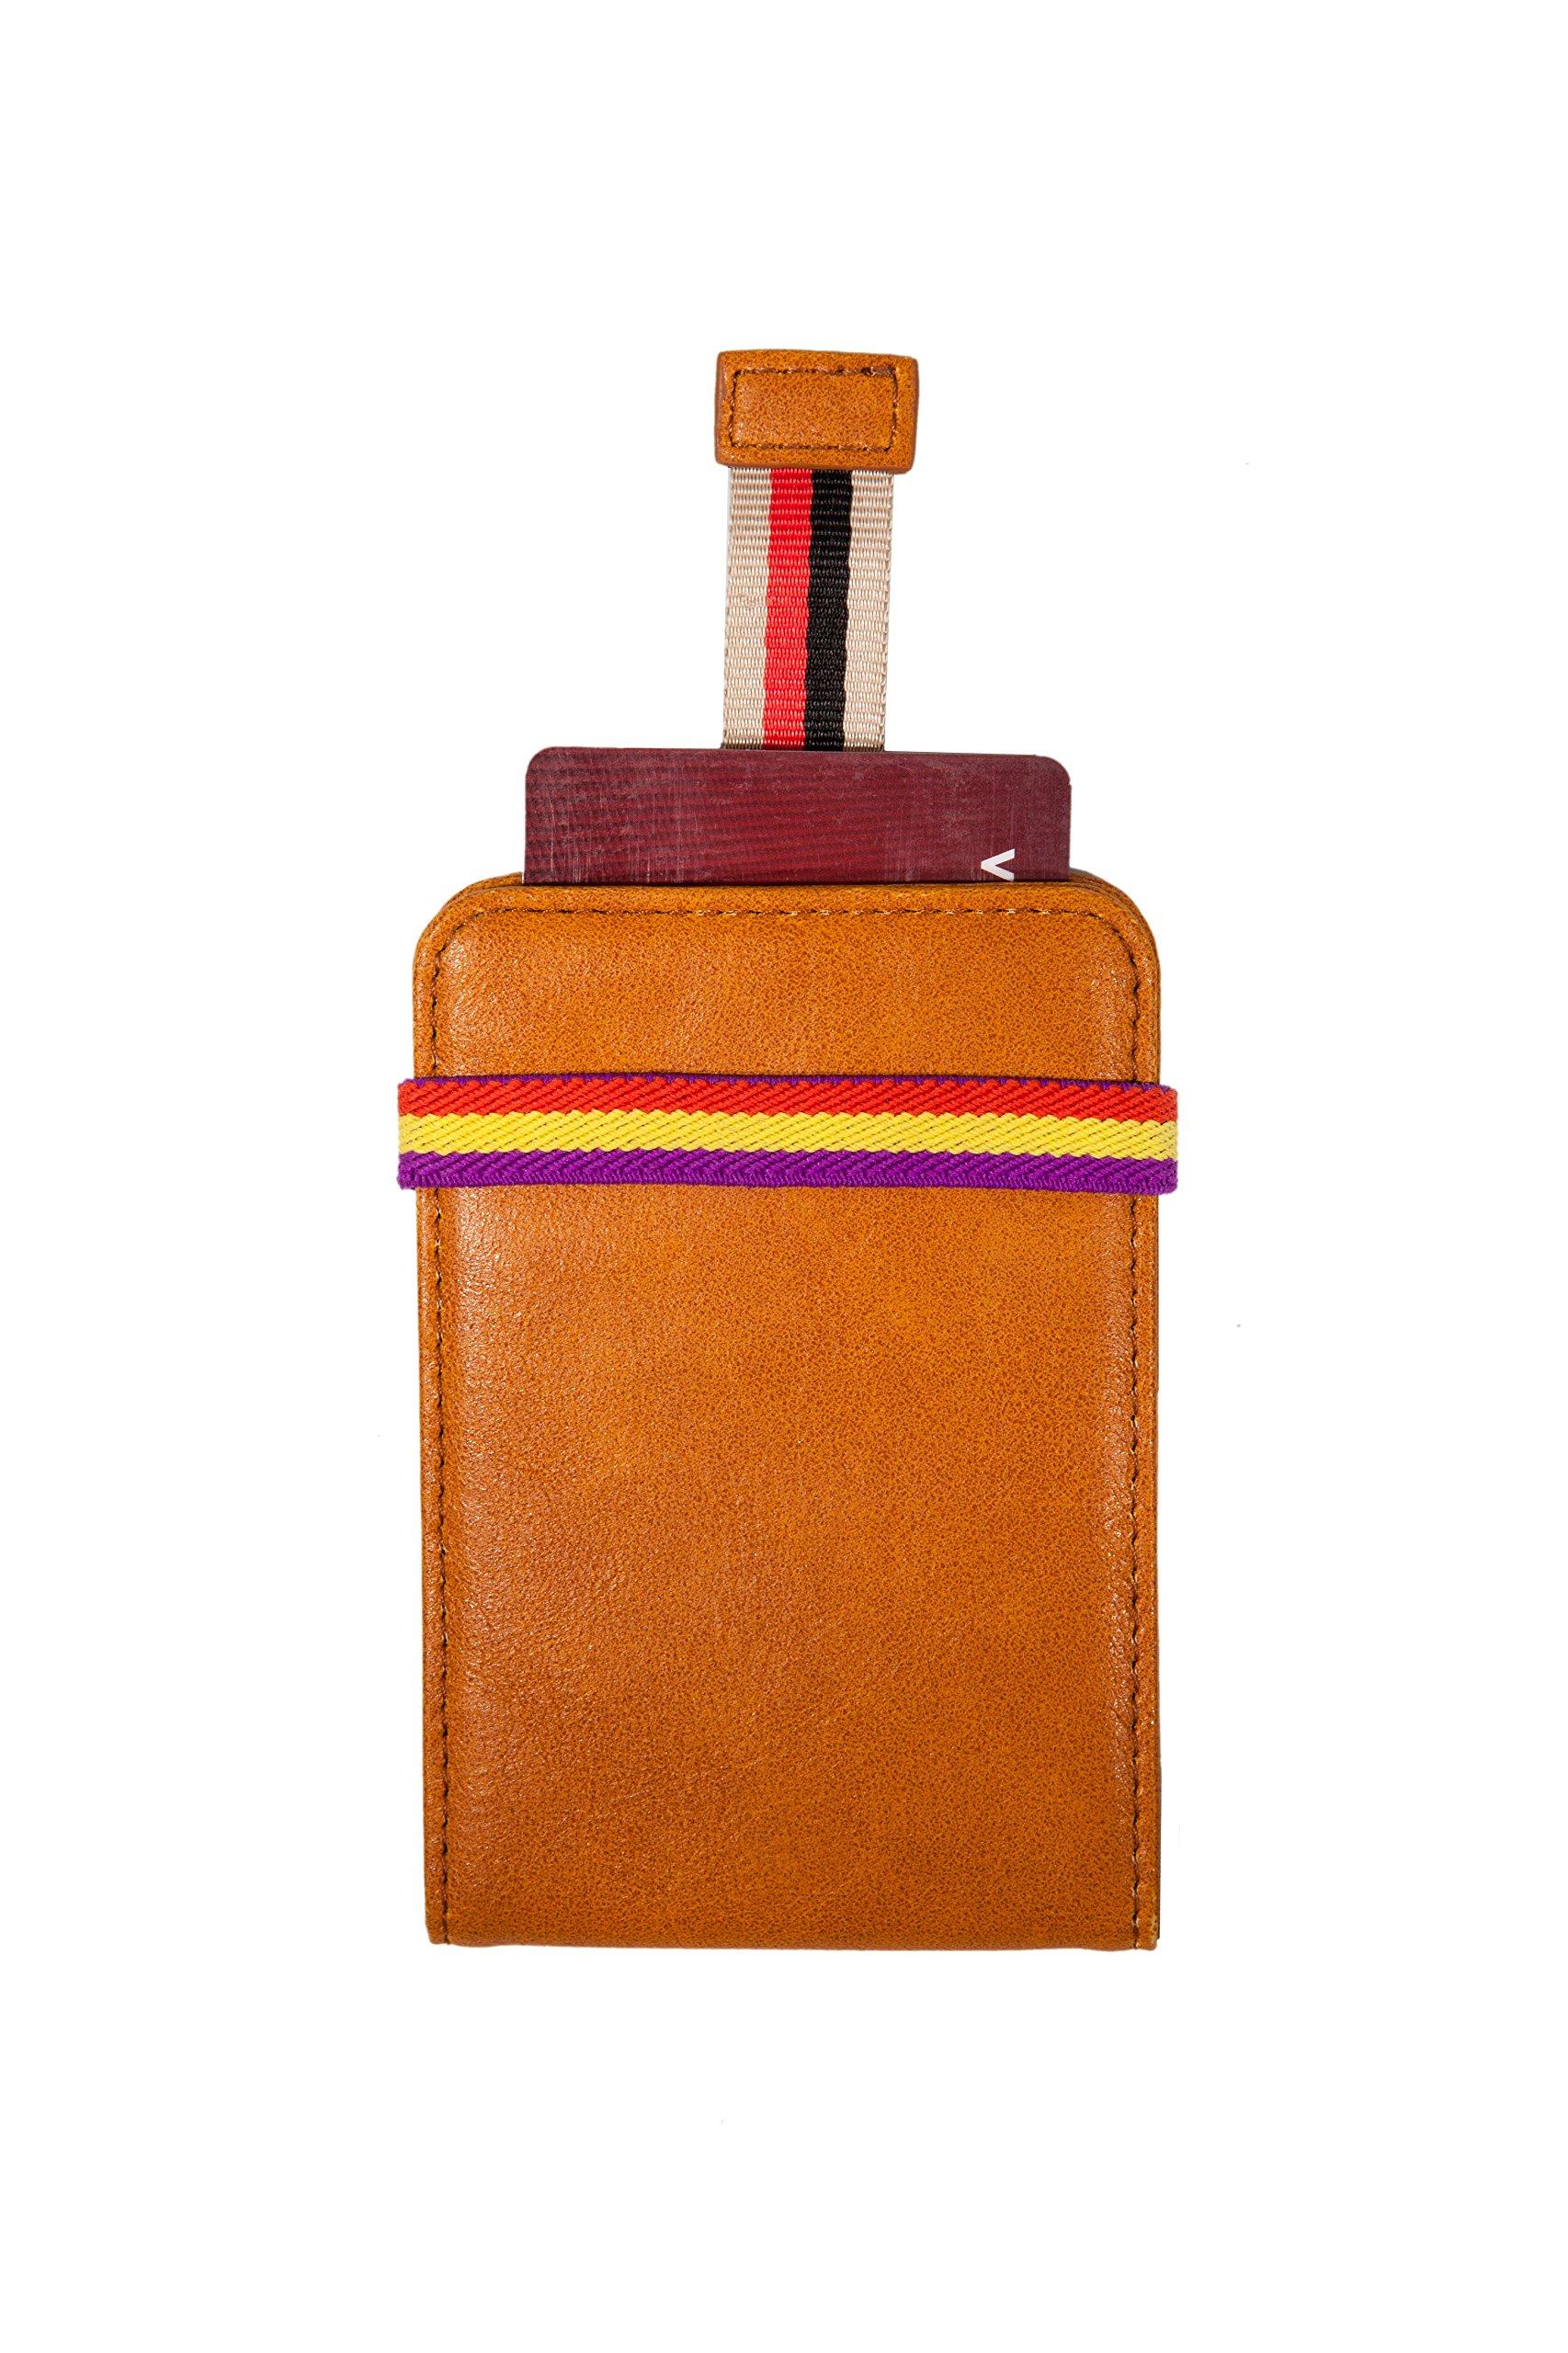 Azzimato - Minimalist Front Pocket Men's Card Holder Slim Wallet - Gift Box Included